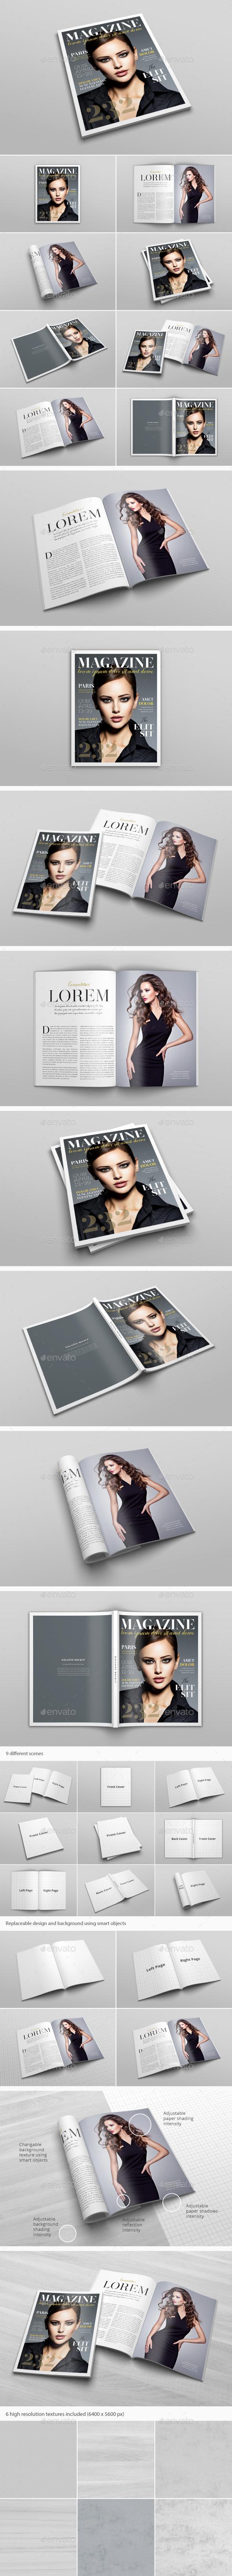 US Letter Magazine Mockup - Magazines Print